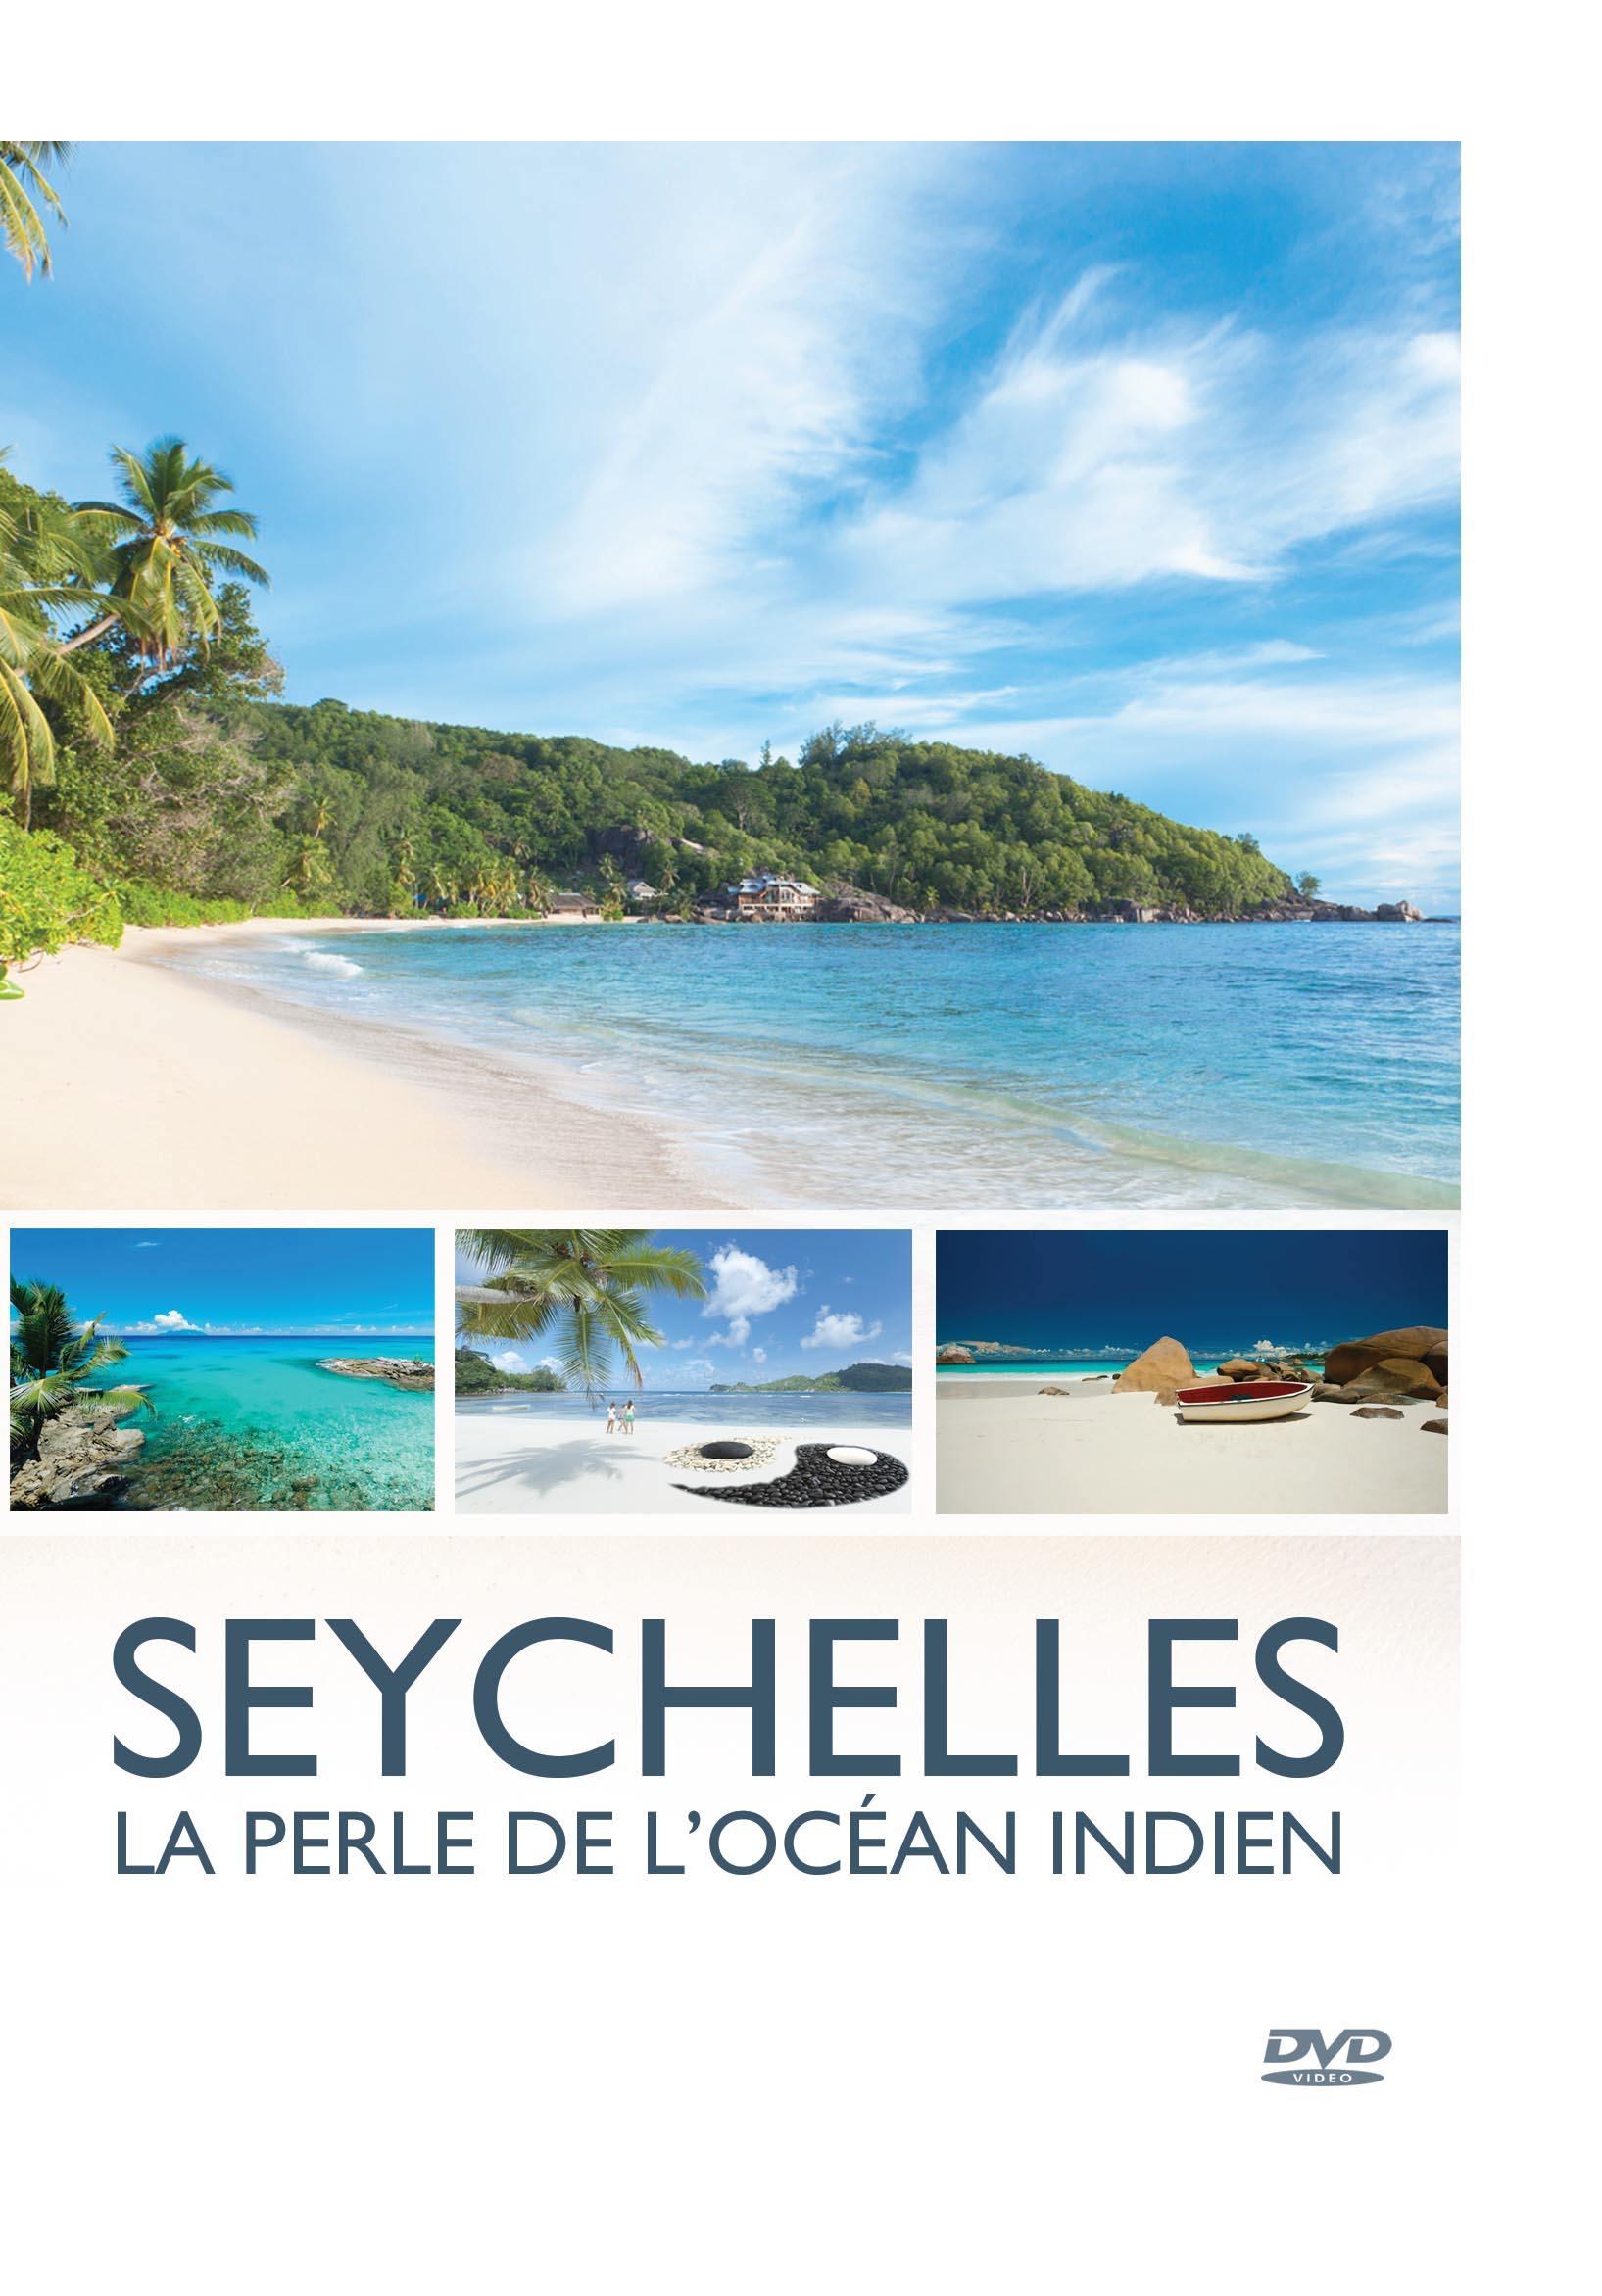 Seychelles - la perle de l'ocean indien - dvd